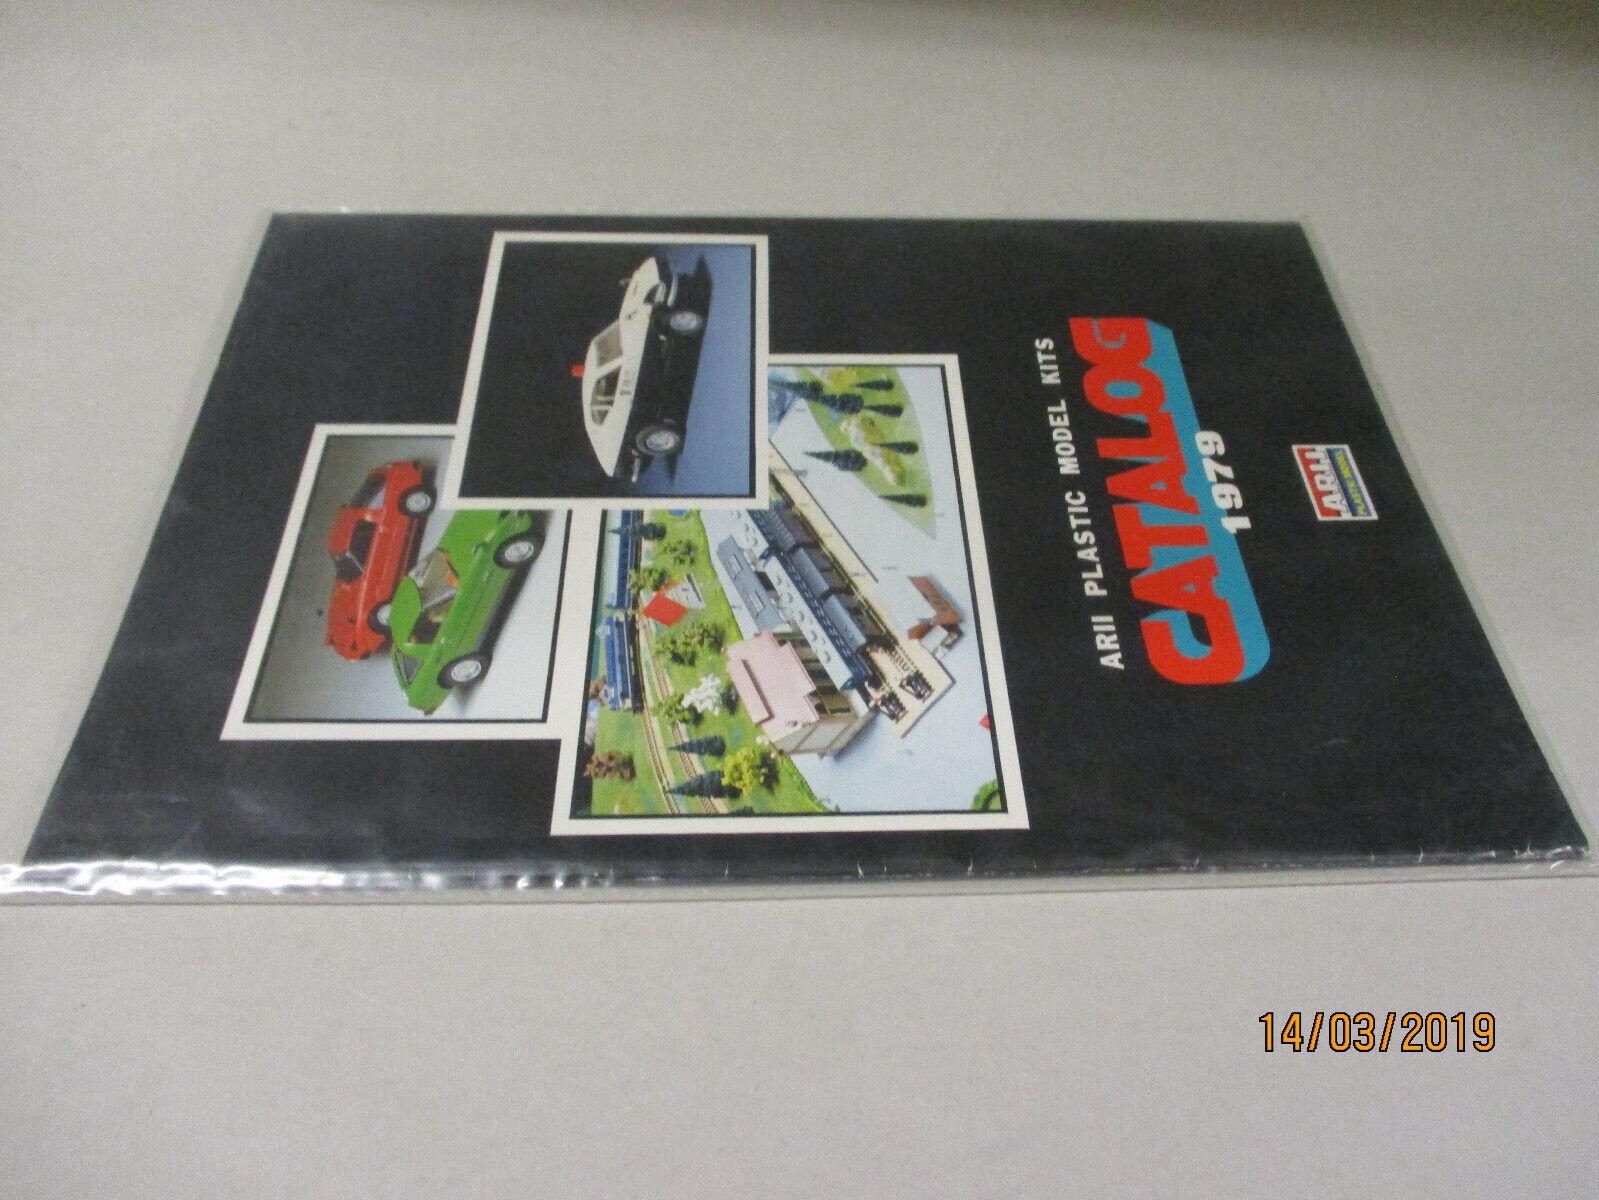 ARII ARII ARII Model Bausätze Katalog  1979  | Bunt,  05d74b